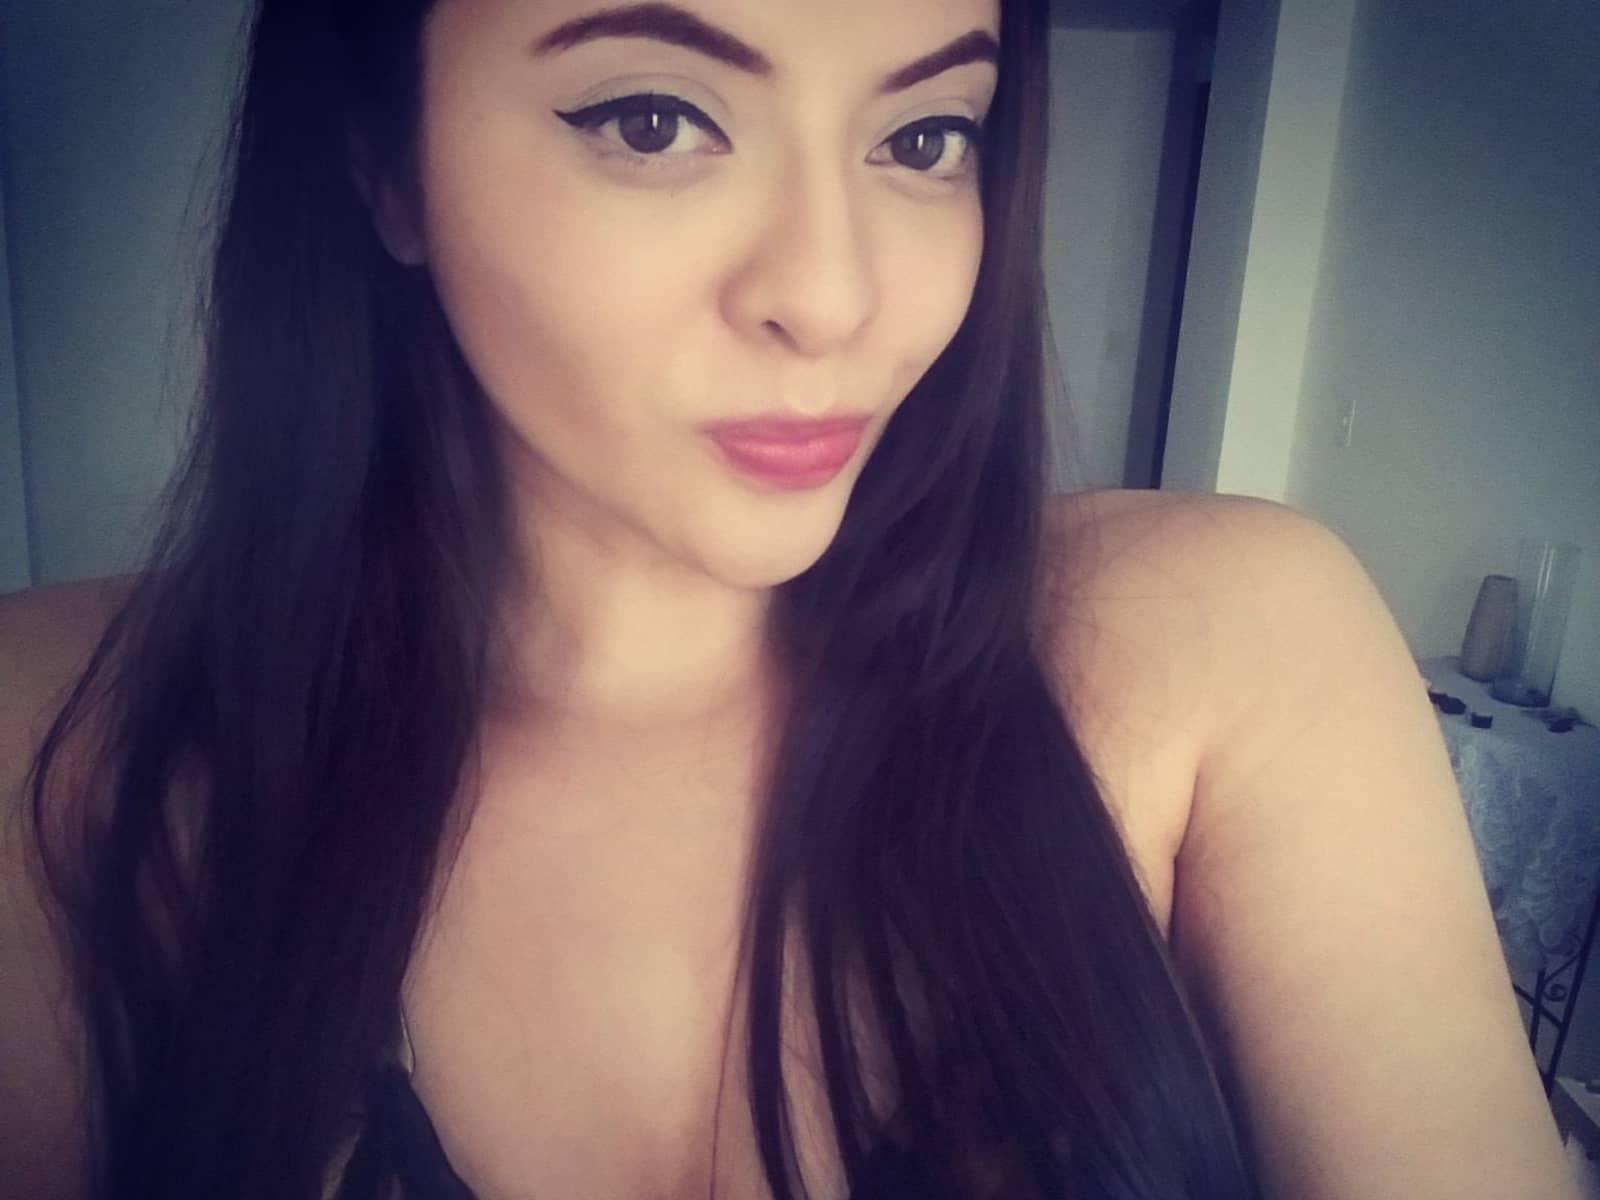 Alexandra from Bogotá, Colombia